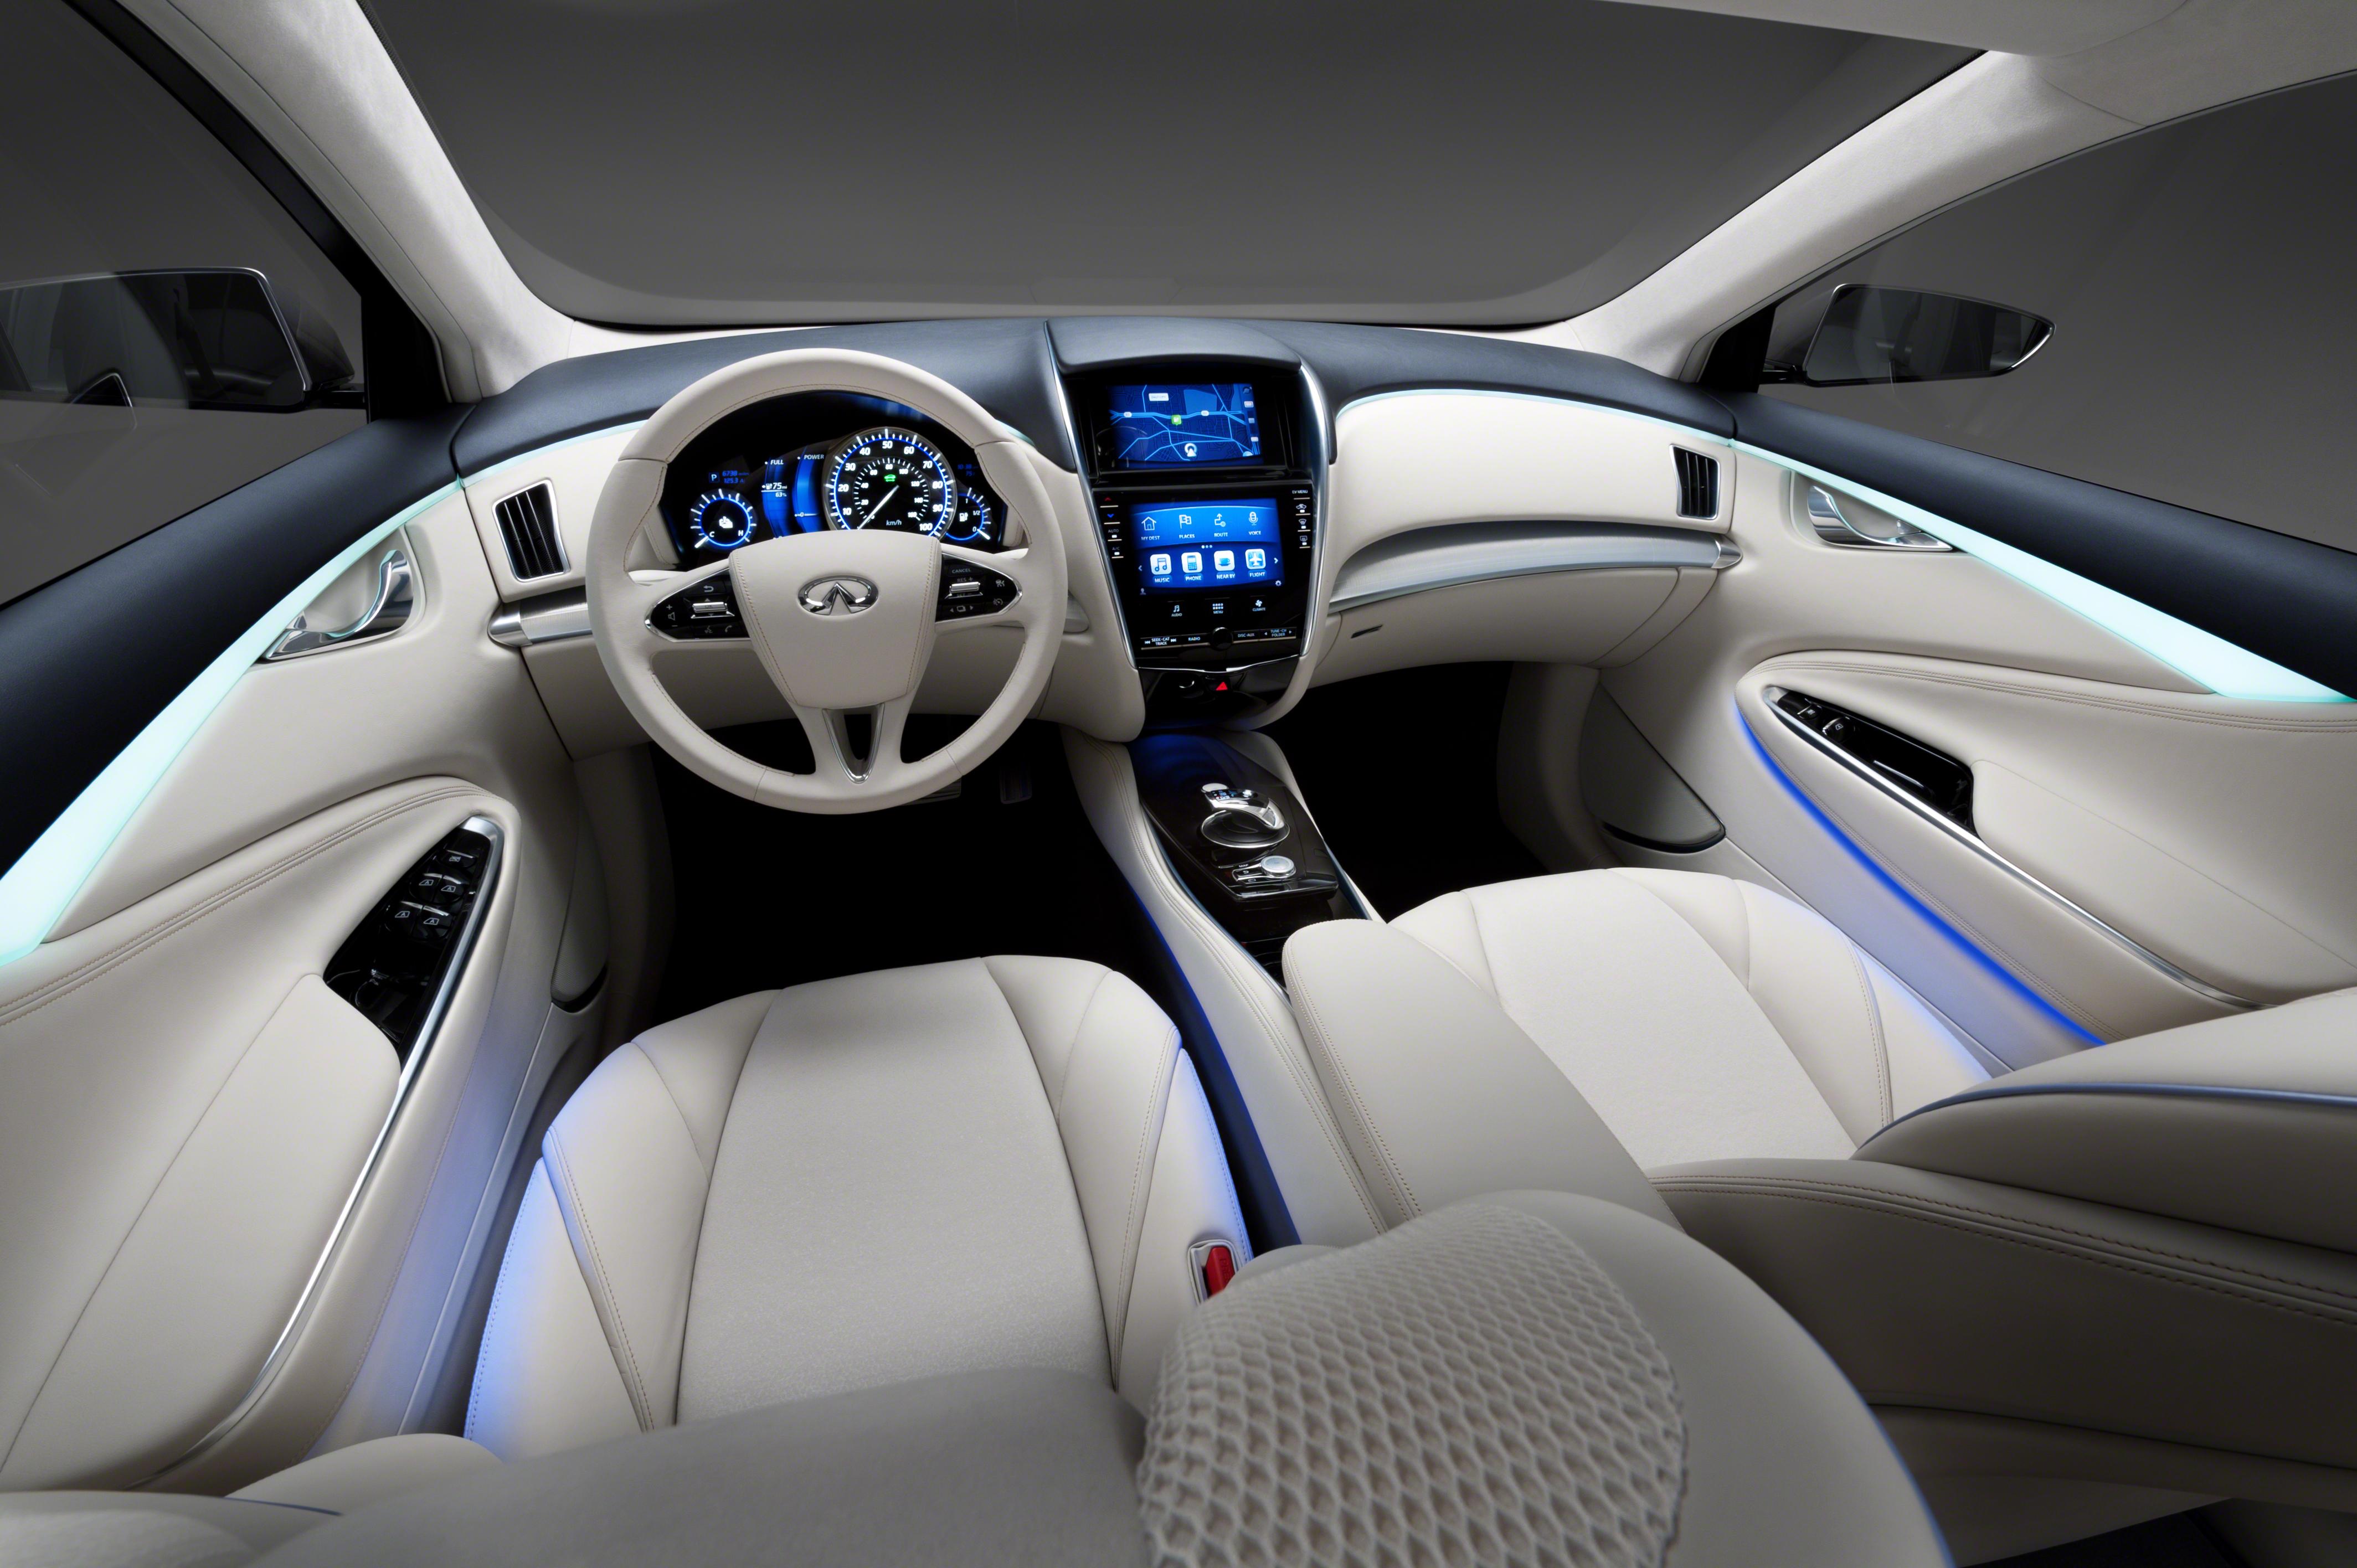 The Infiniti Le Electric Car Concept 4k Ultra Hd Wallpaper